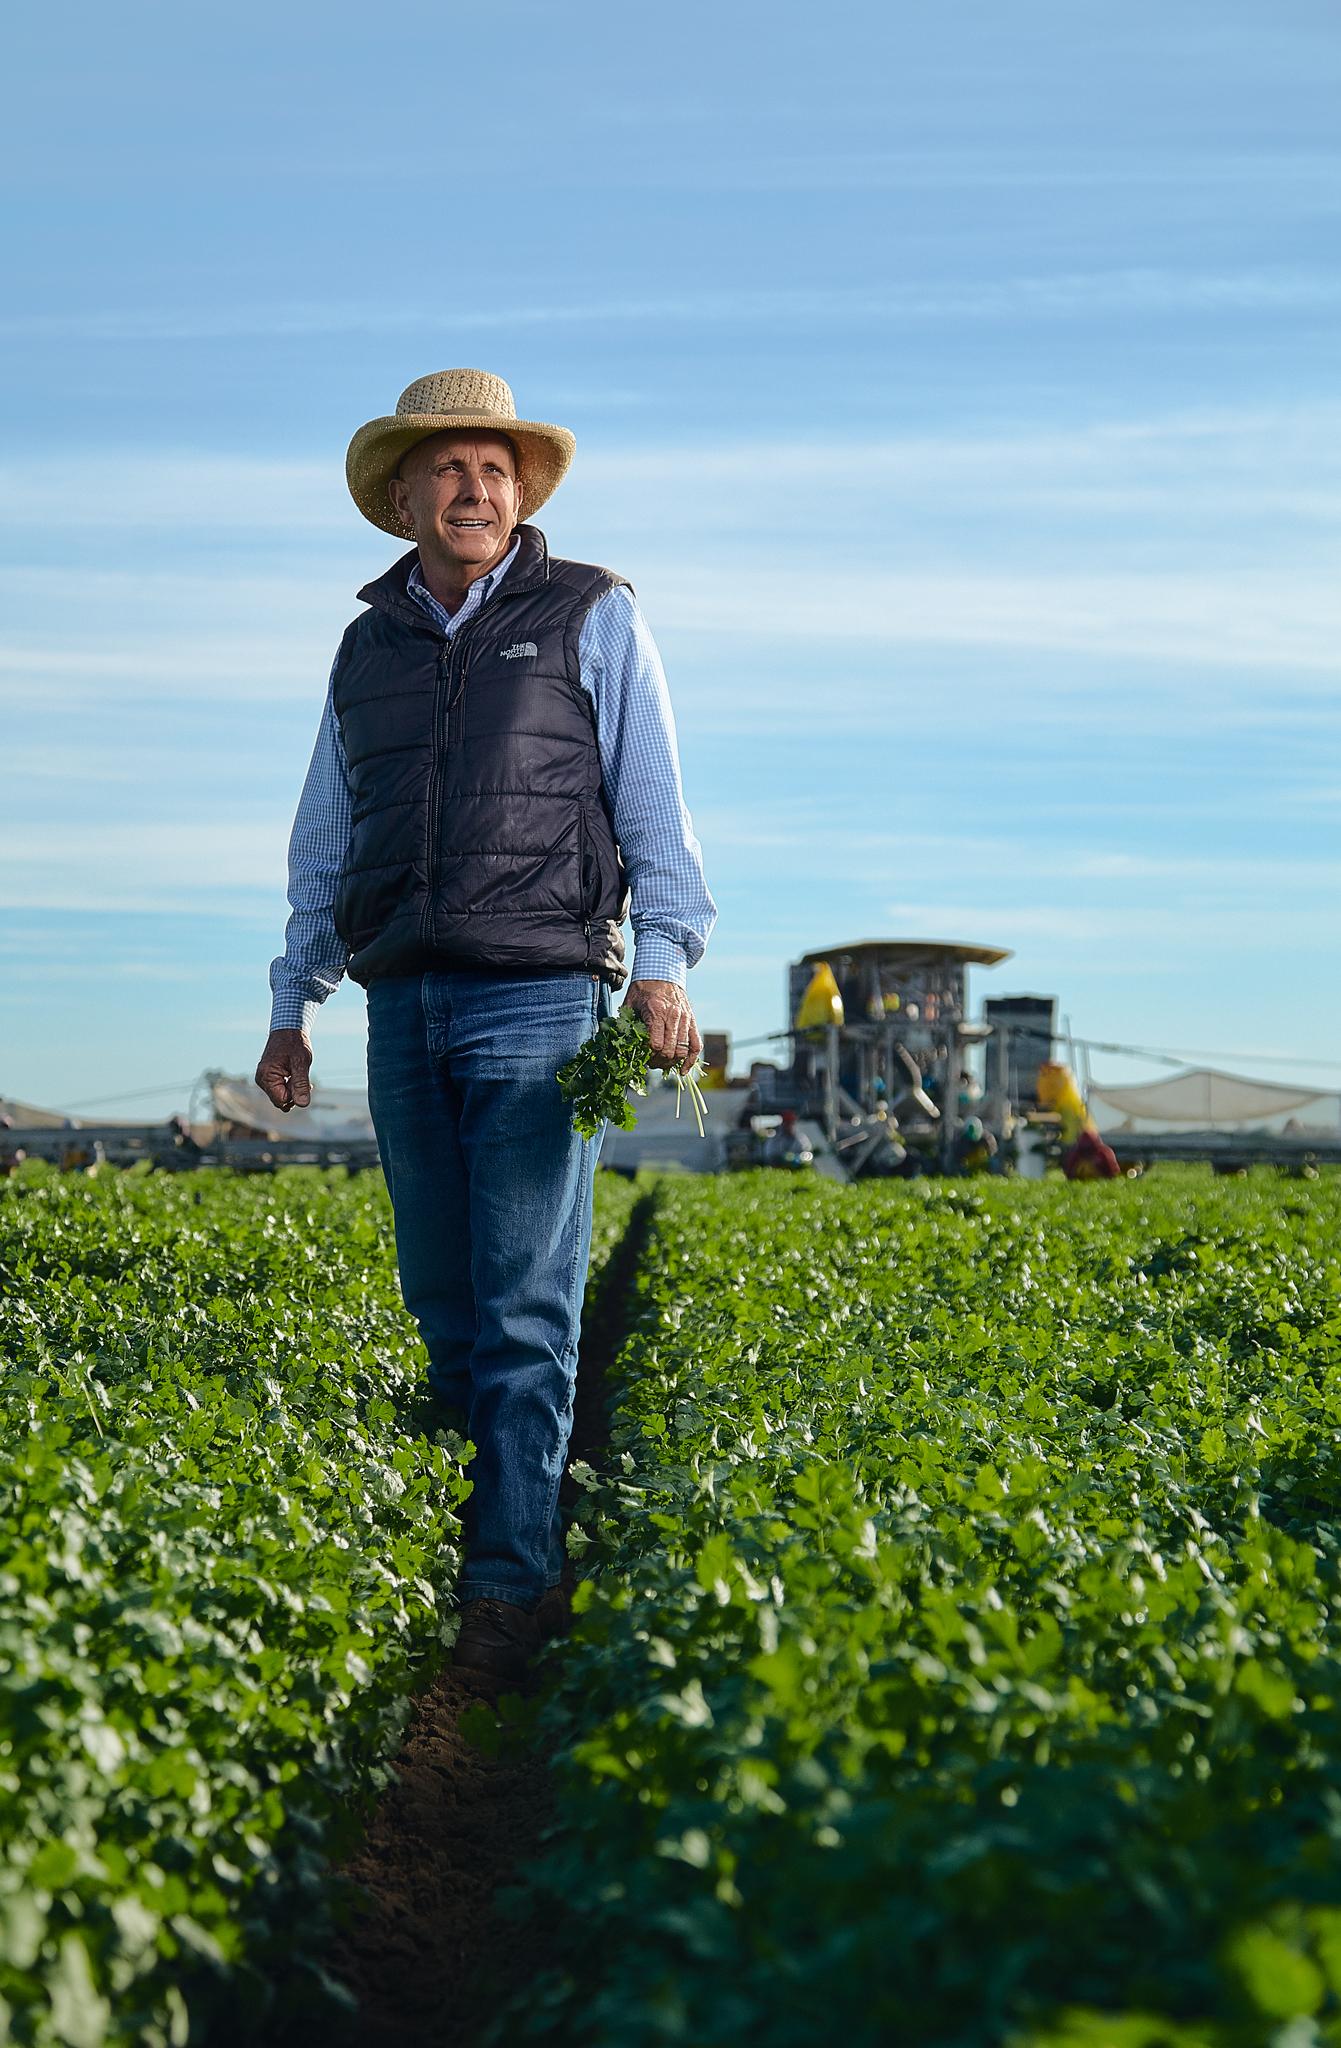 Arizona Editorial Photographer - Eatingwell Magazine Farmer